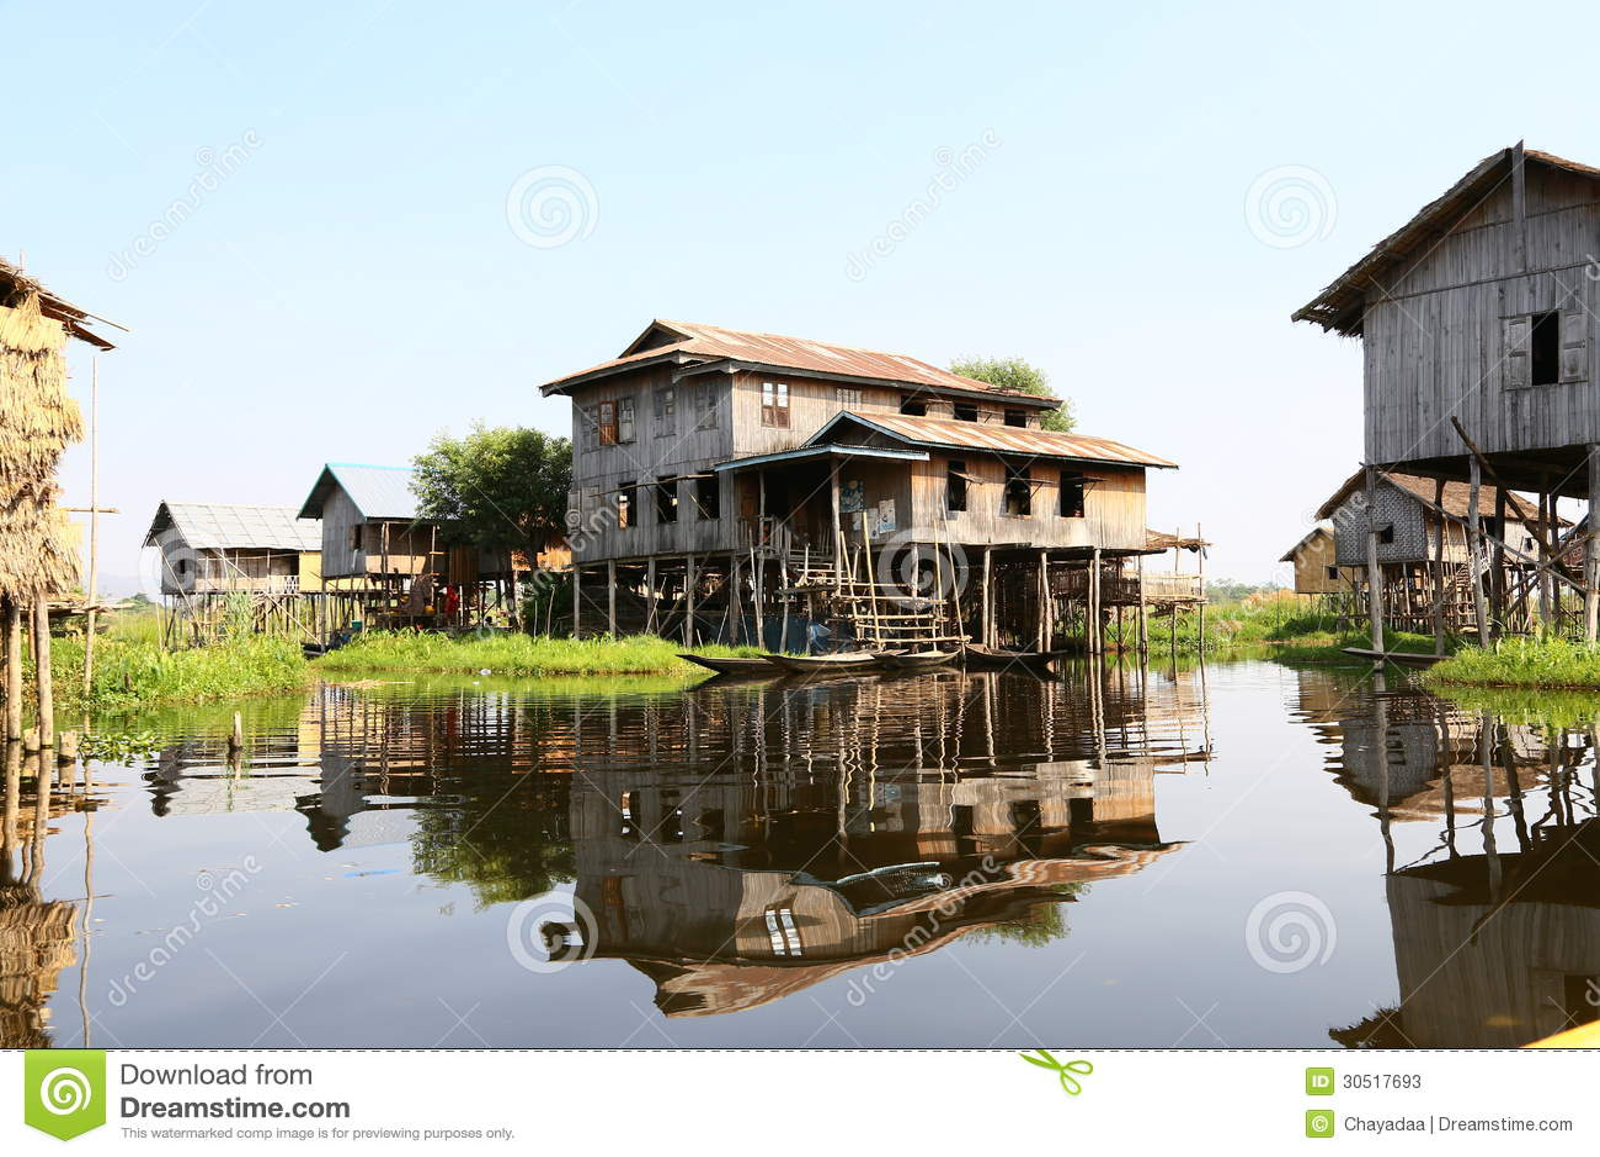 Wooden Home Ywama Village Stock Photos Image 30517693